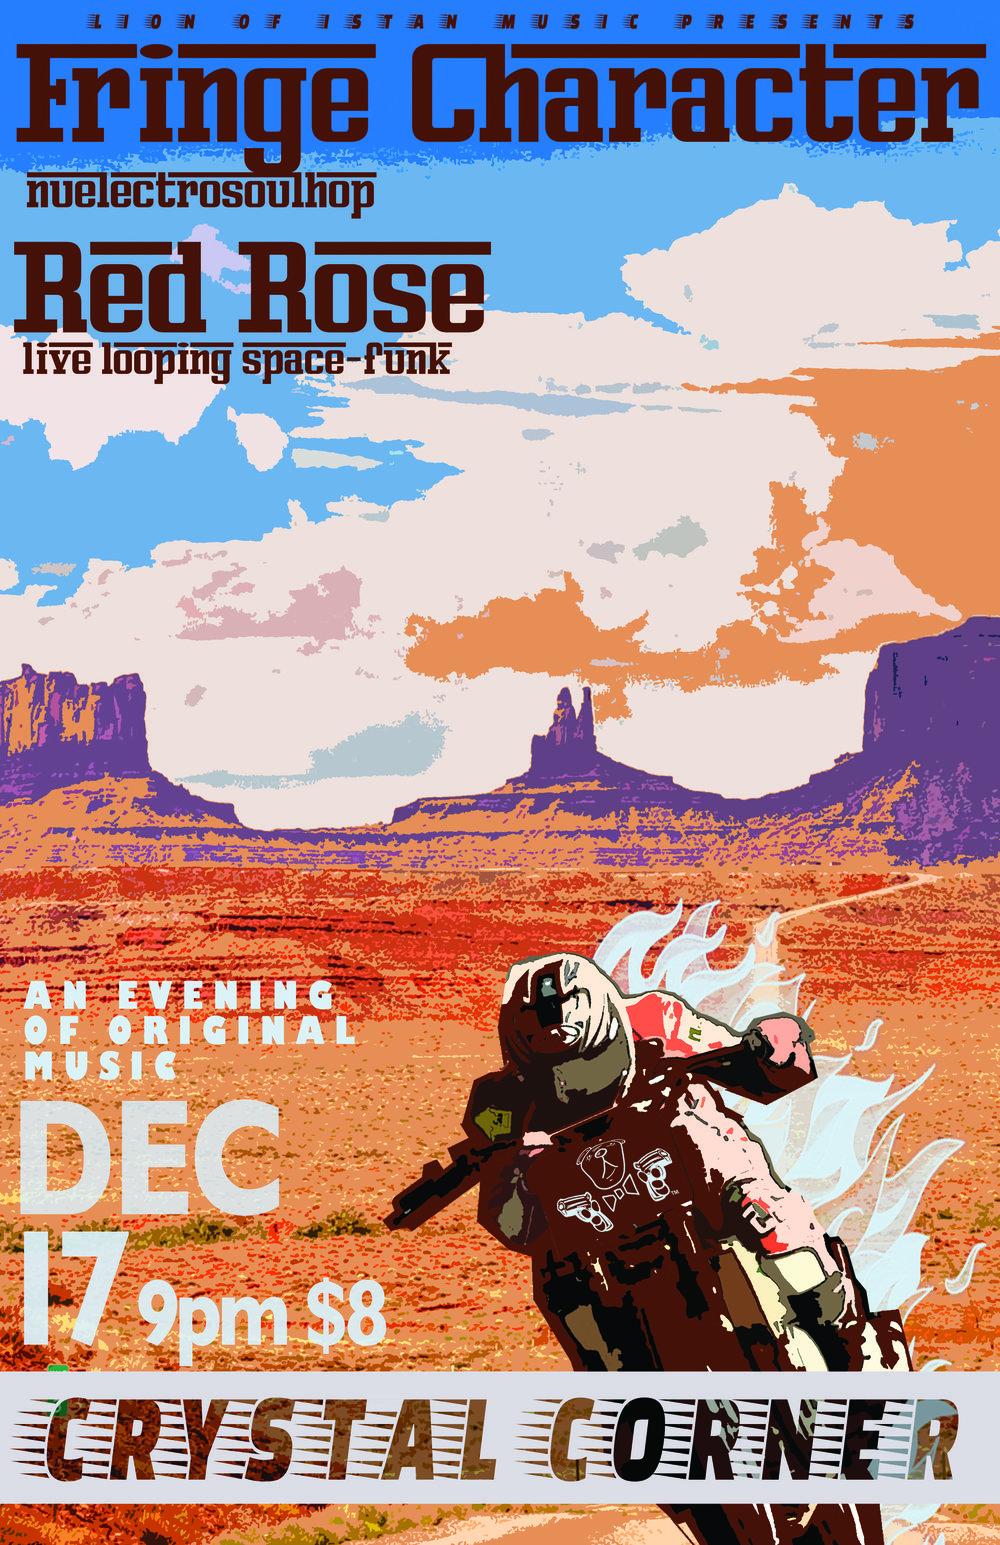 Fringe Character | Red Rose @ The Crystal Corner